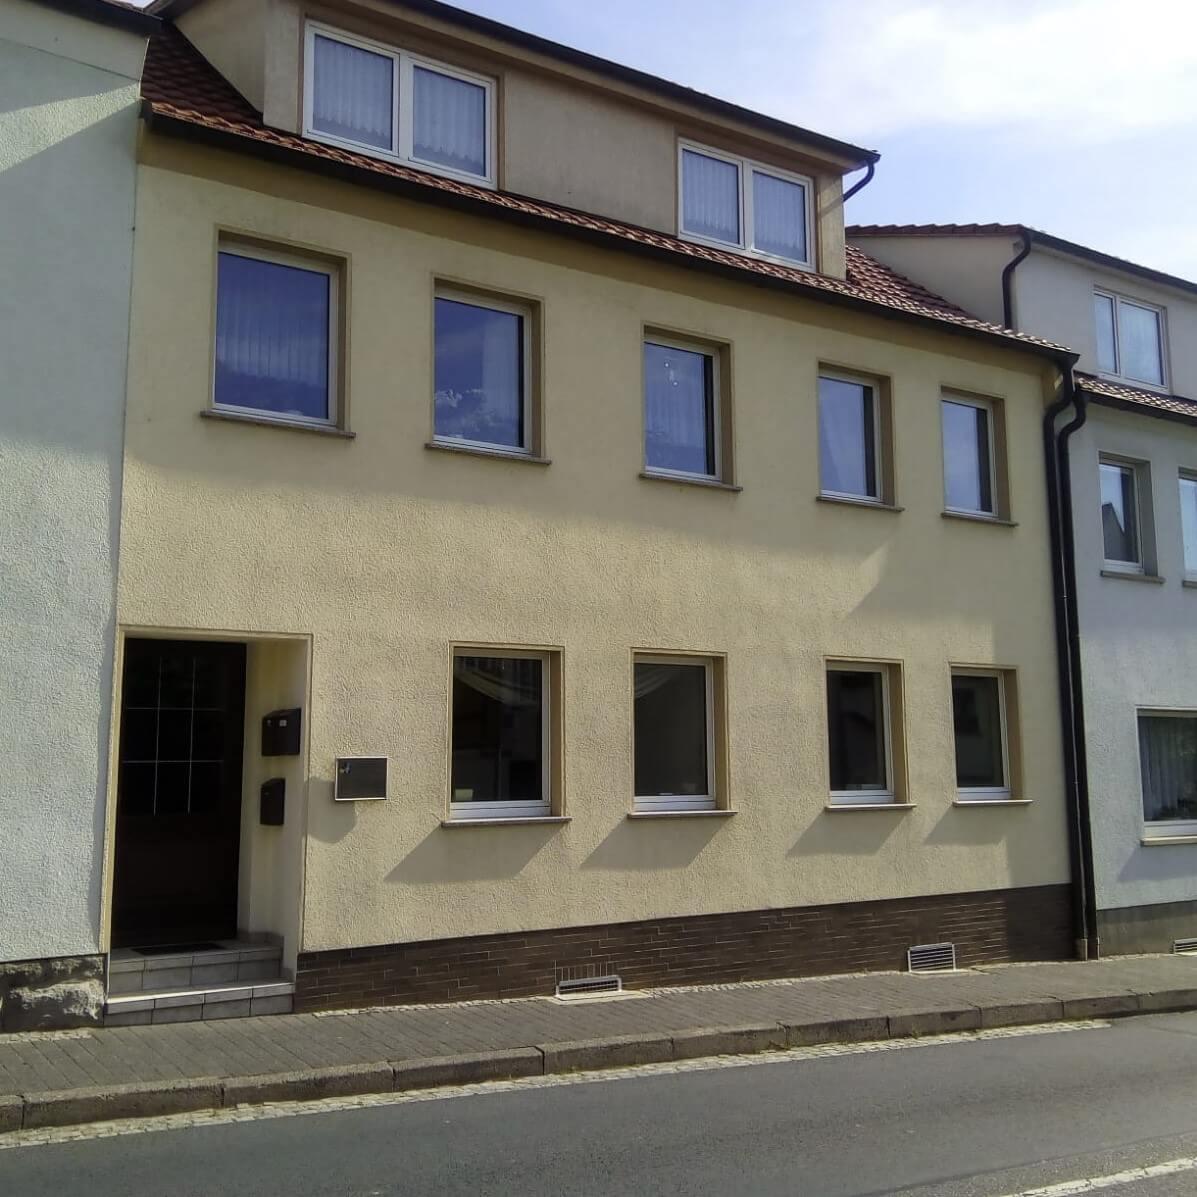 Praxis Creuzburg